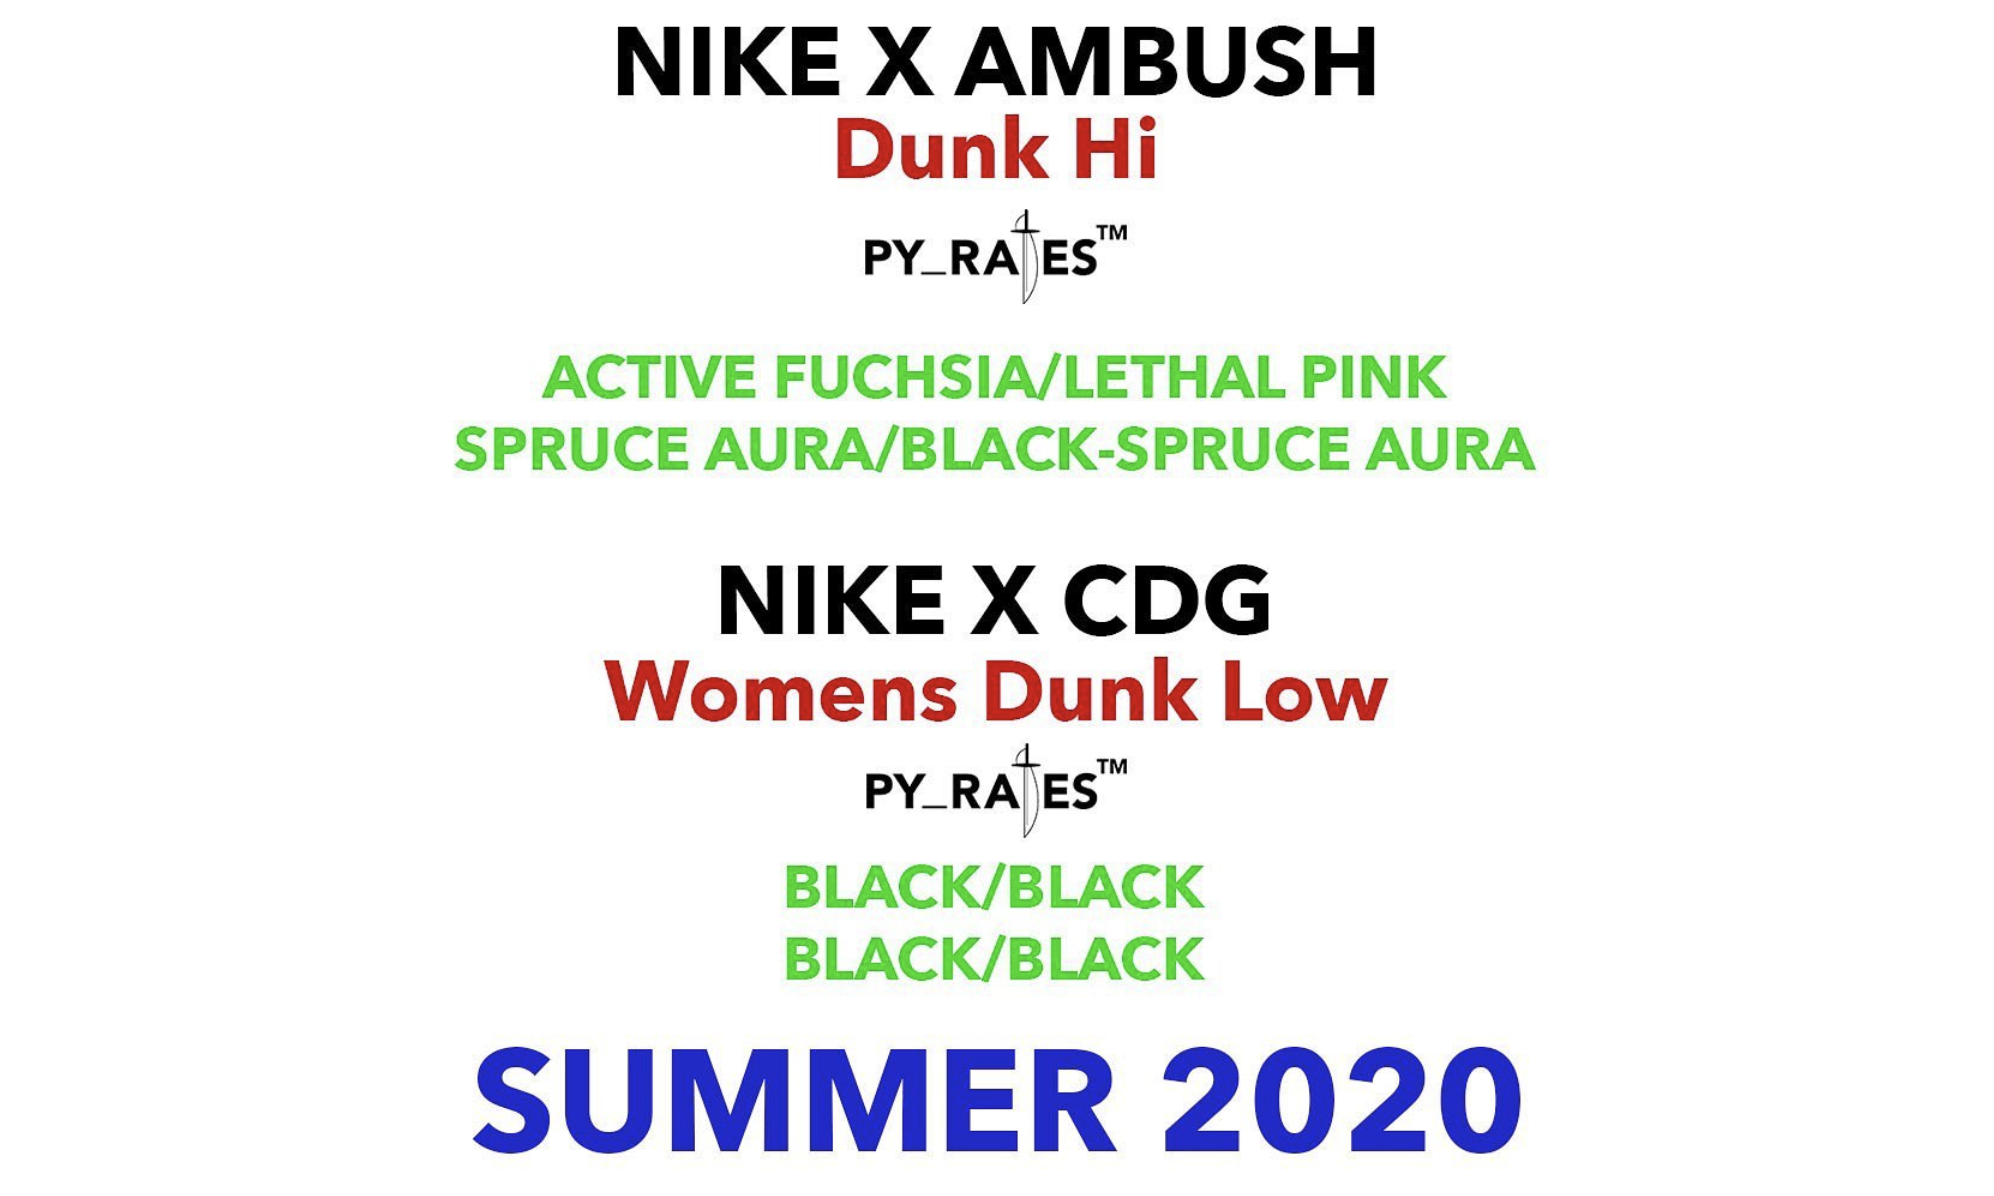 AMBUSH、CdG 将在明年分别推出 Dunk 联名设计